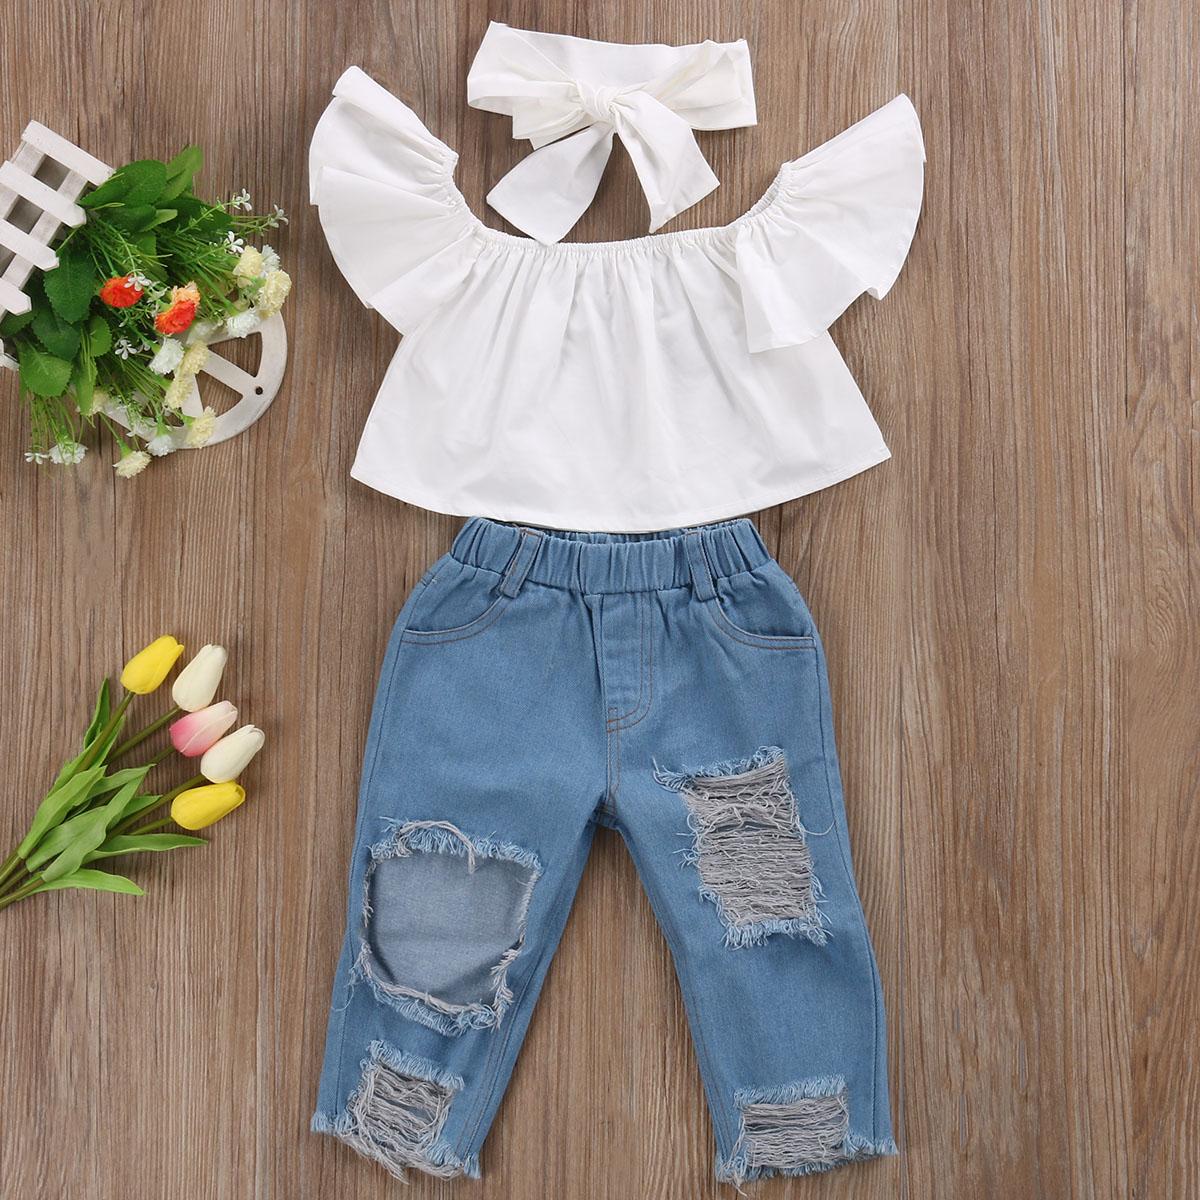 Children Clothes Set 2017 Fashion Off Shoulder White Baby Girls Shirt +Denim Pants + headband 3pcs Suit Children Clothing